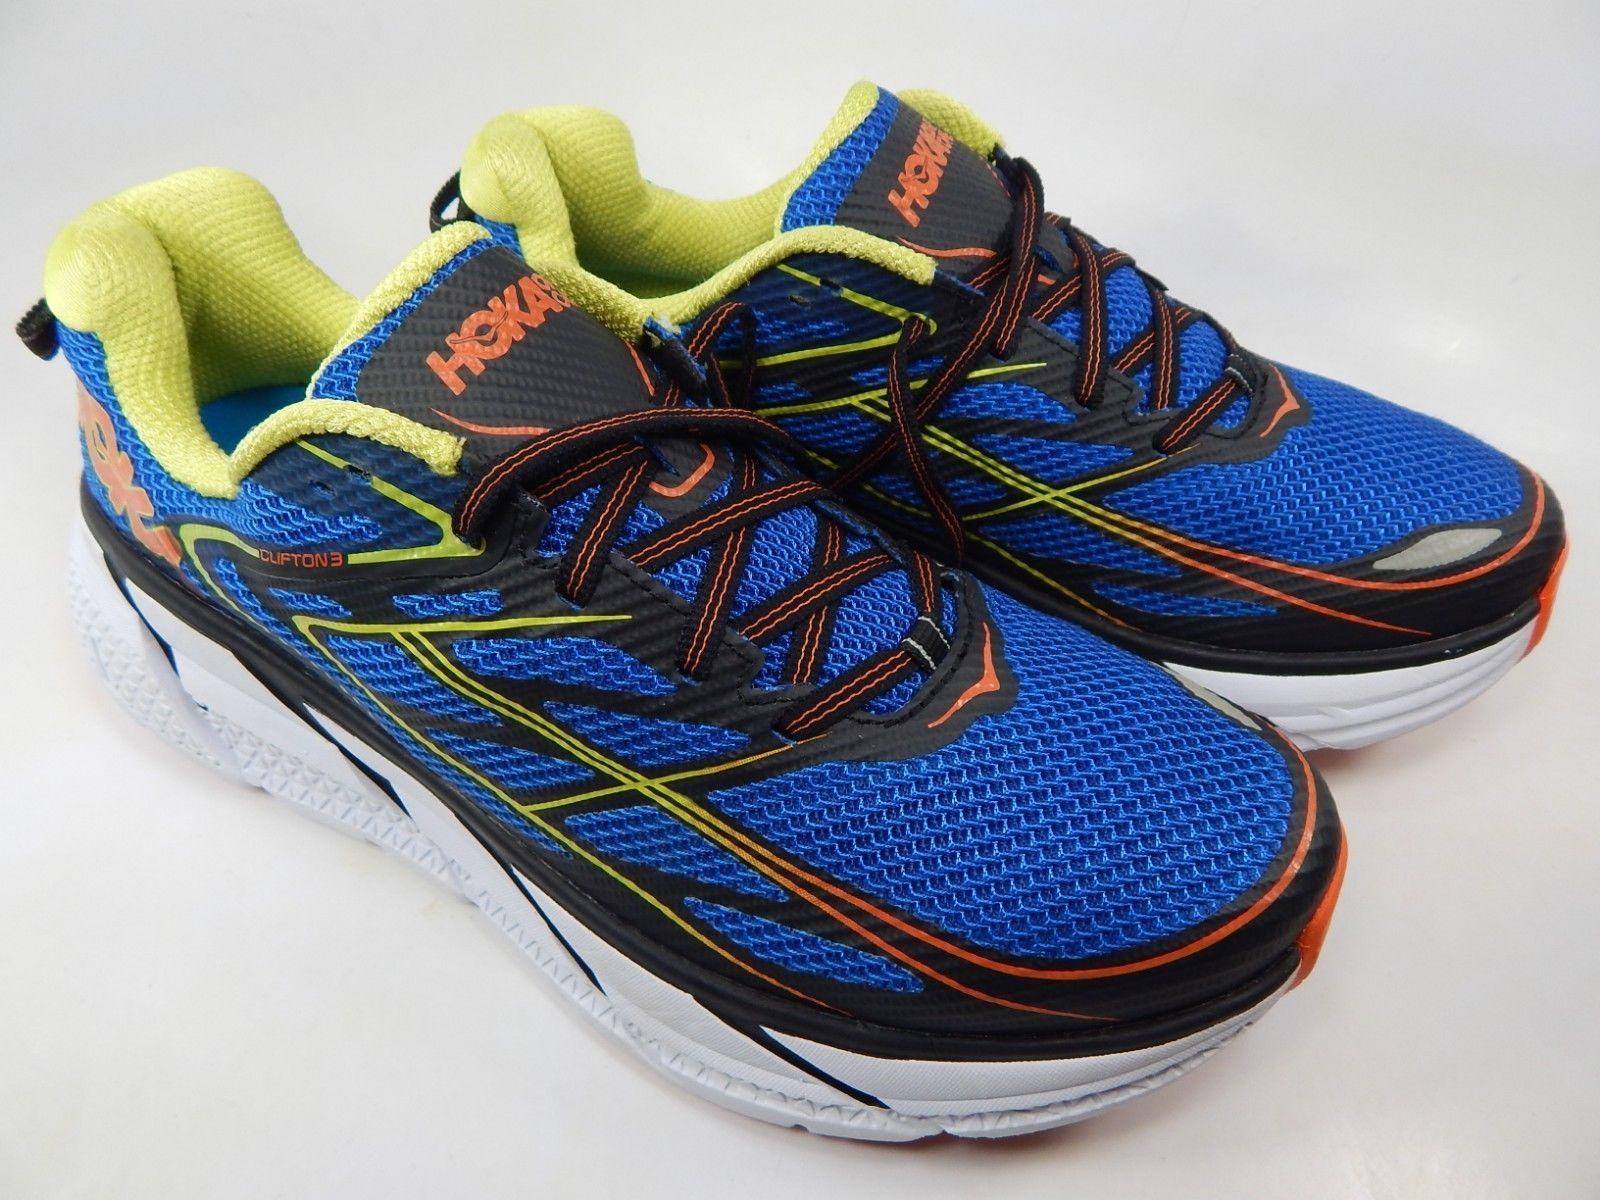 Hoka One One Clifton 3 Size 9 M (D) EU 42 2/3 Men's Running Shoes Blue 1012046